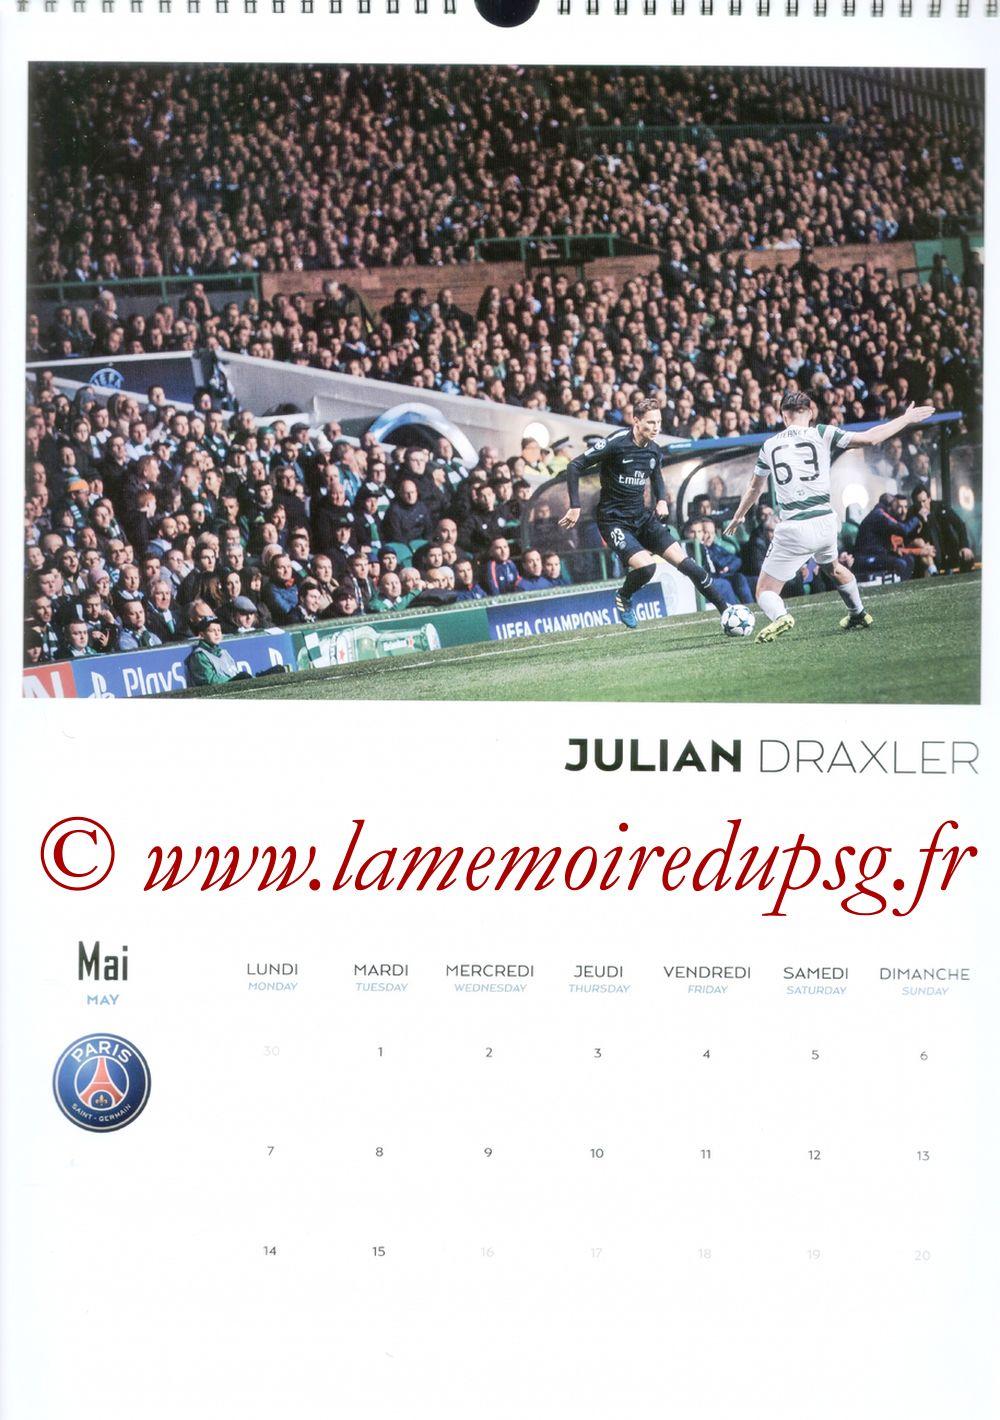 Calendrier PSG 2018 - Page 09 - Julian DRAXLER